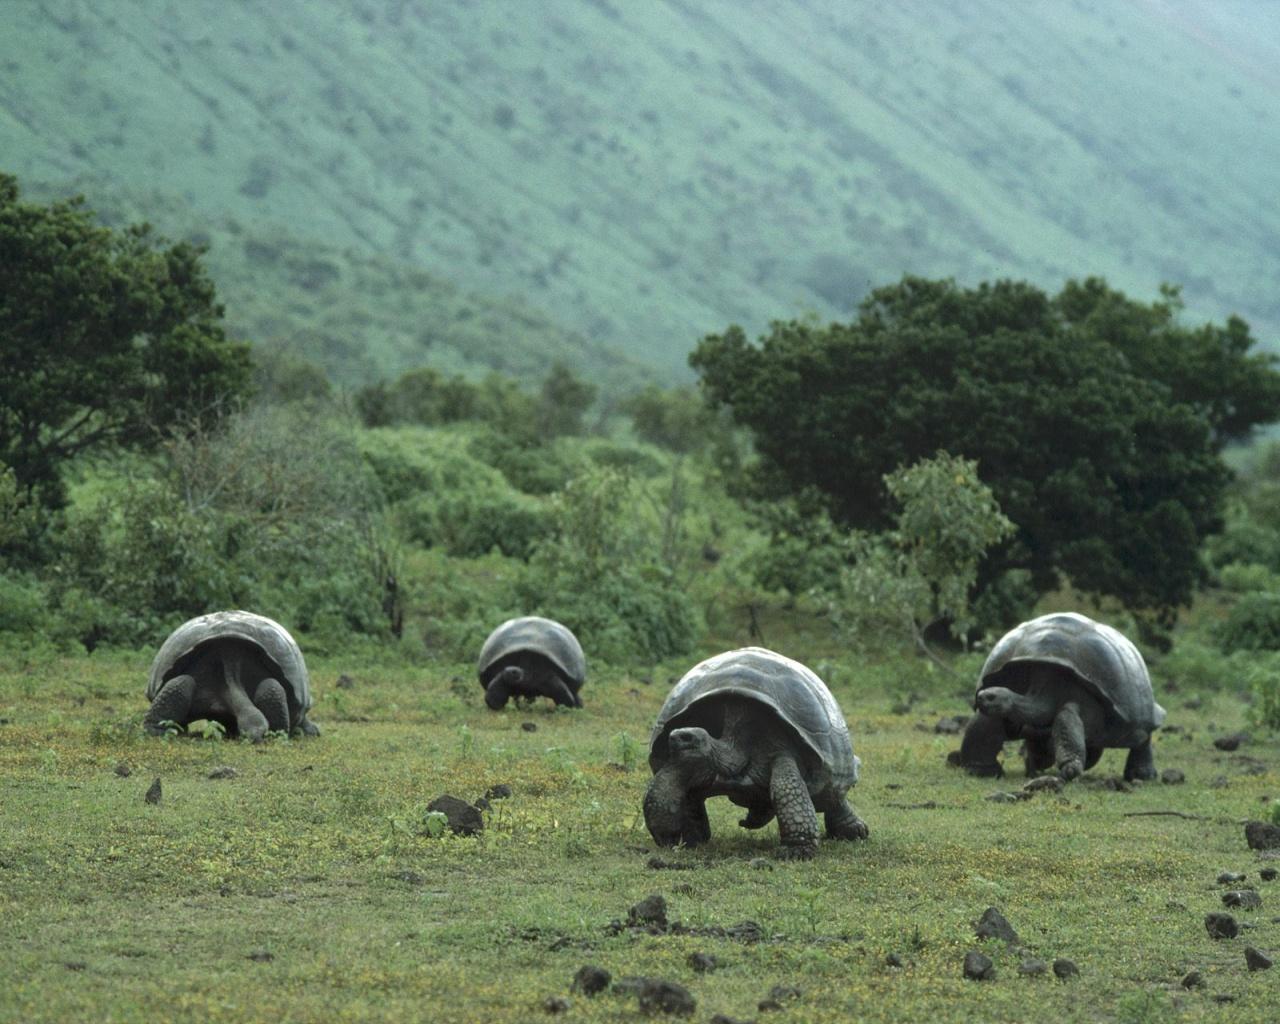 Previous, Animals - Reptiles - Big turtle wallpaper